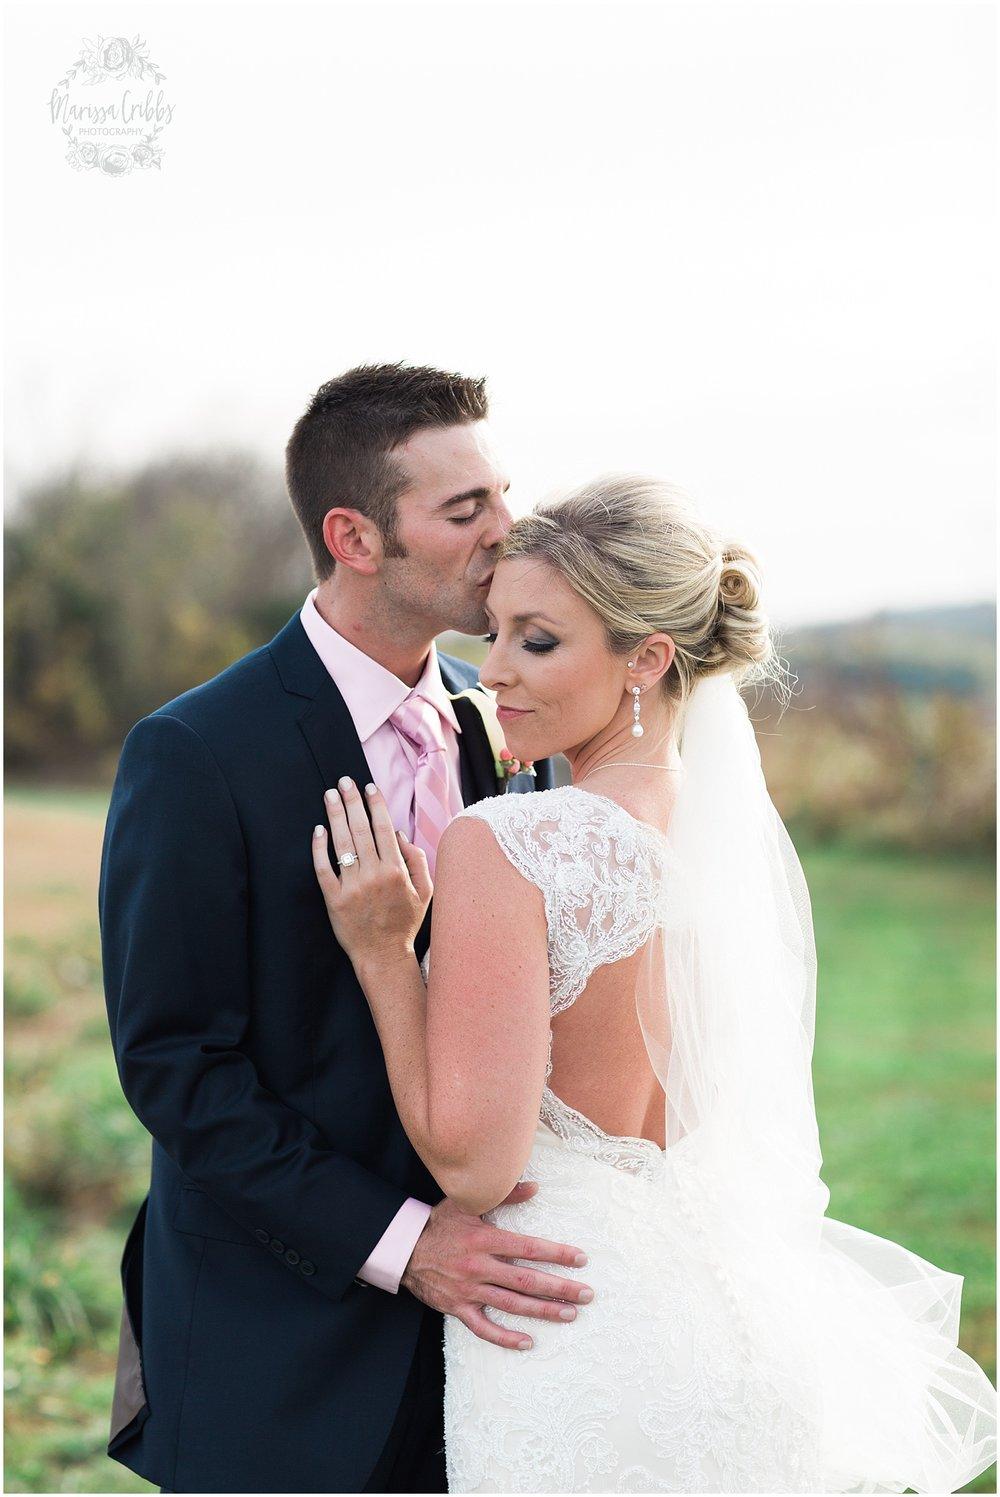 Alex & Amie | Eighteen Ninety Event Space | Marissa Cribbs Photography | Kansas City Perfect Wedding Guide_1304.jpg